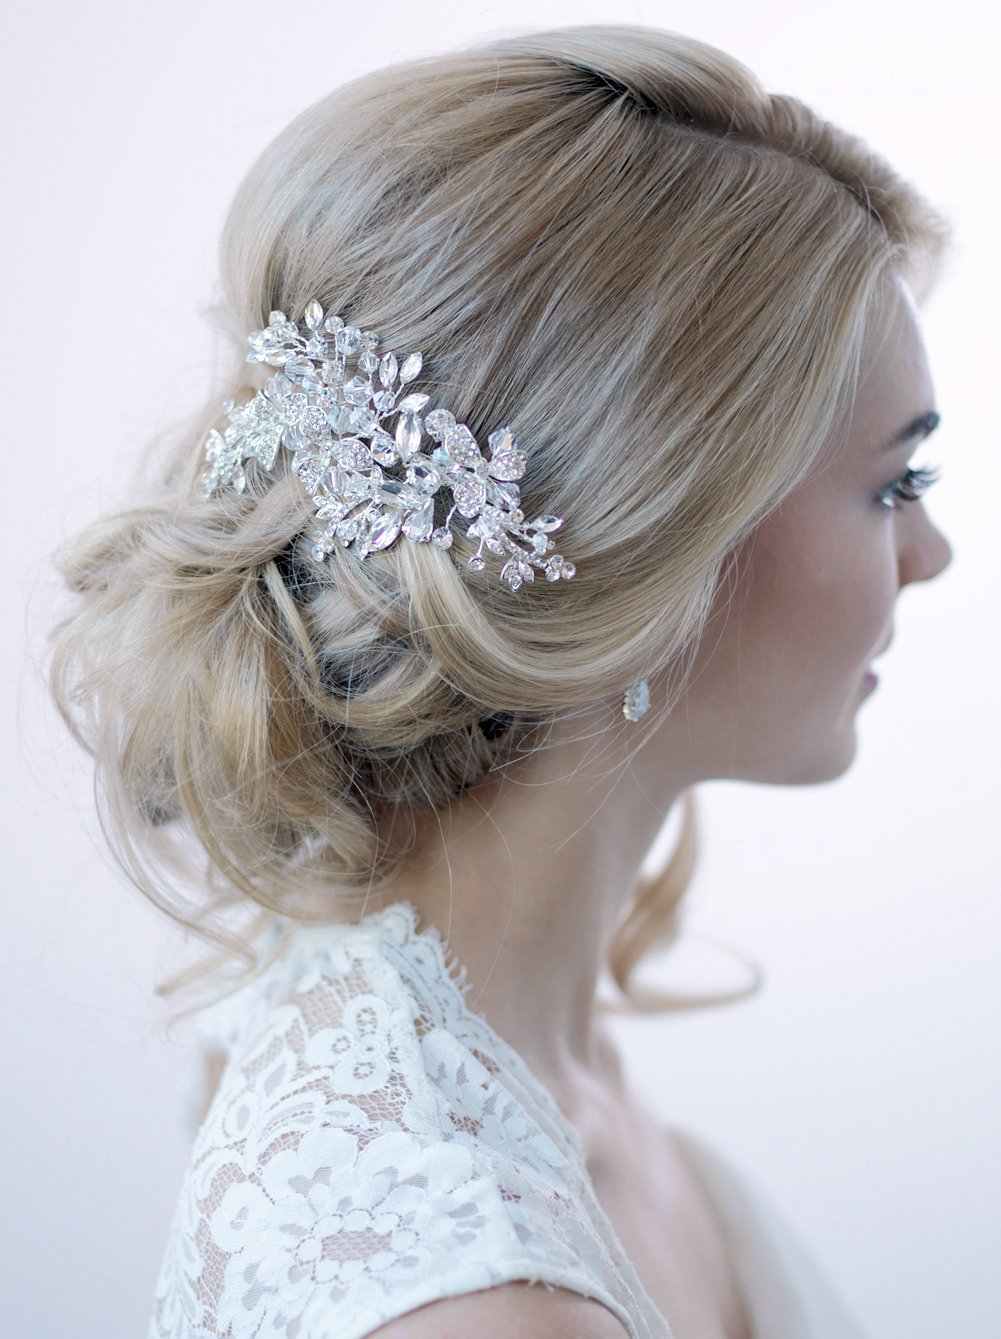 USABride Swarovski Crystal Rhinestone Bridal Clip Wedding Comb Hair Accessory TC-2265 by USABride